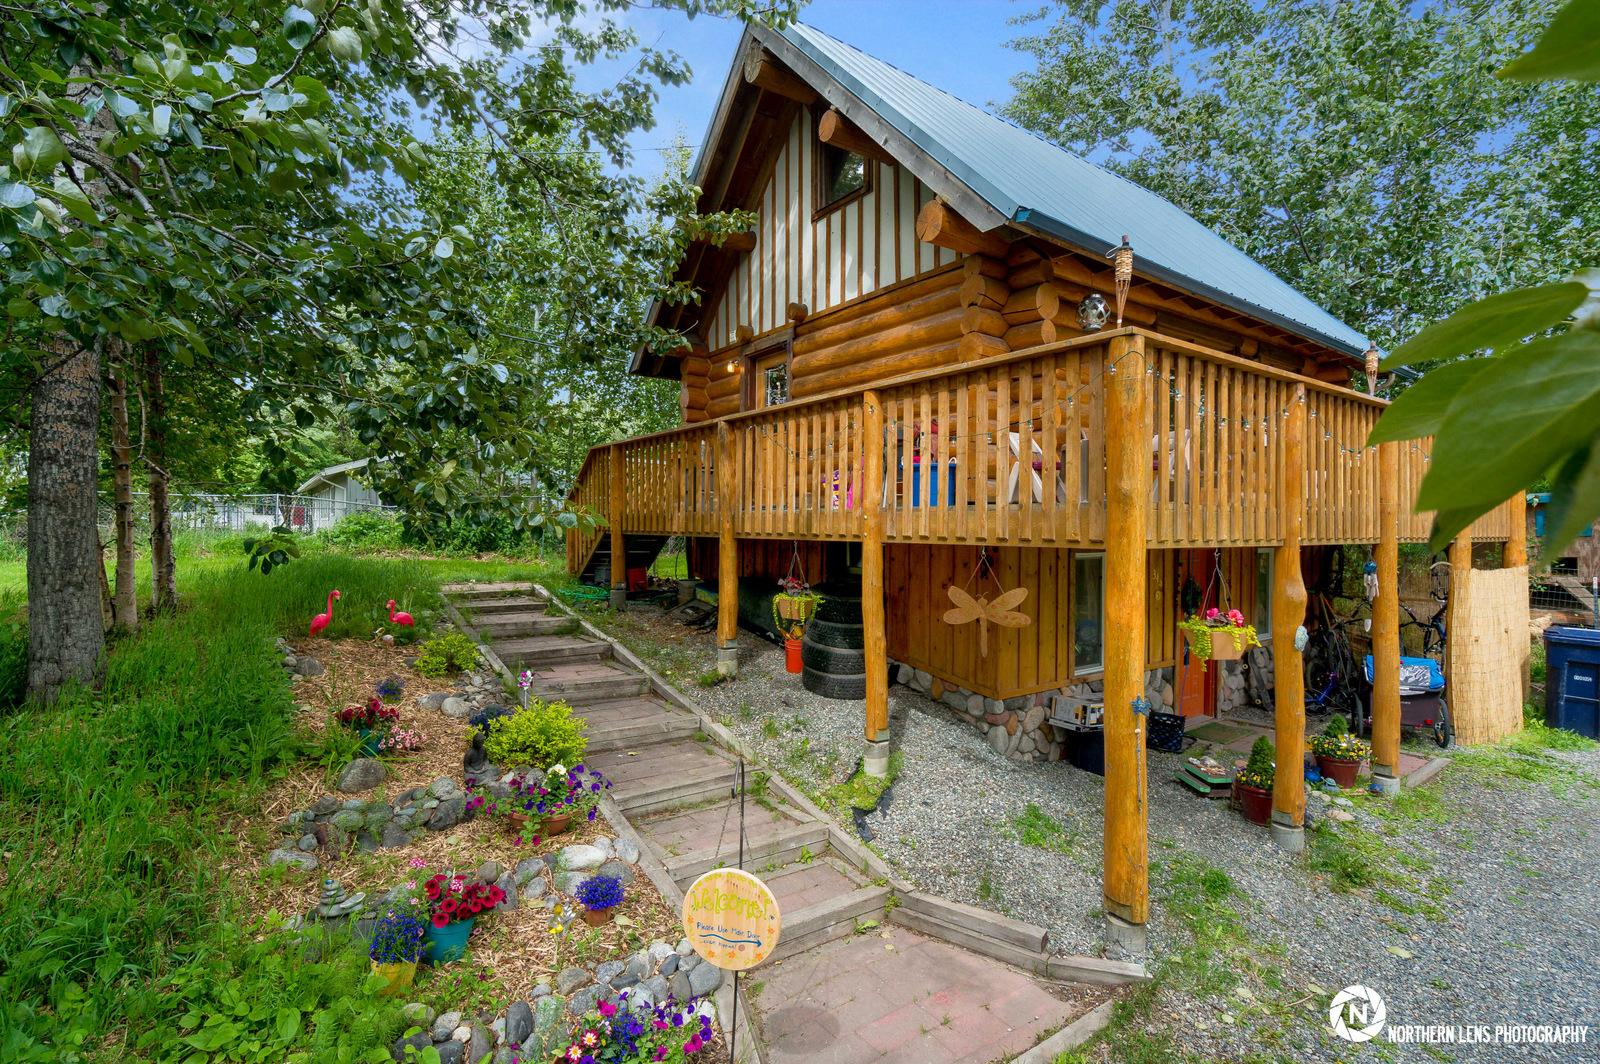 anchorage real estate photographer palmer real estate palmer ak cabin style home photo marcus biastock